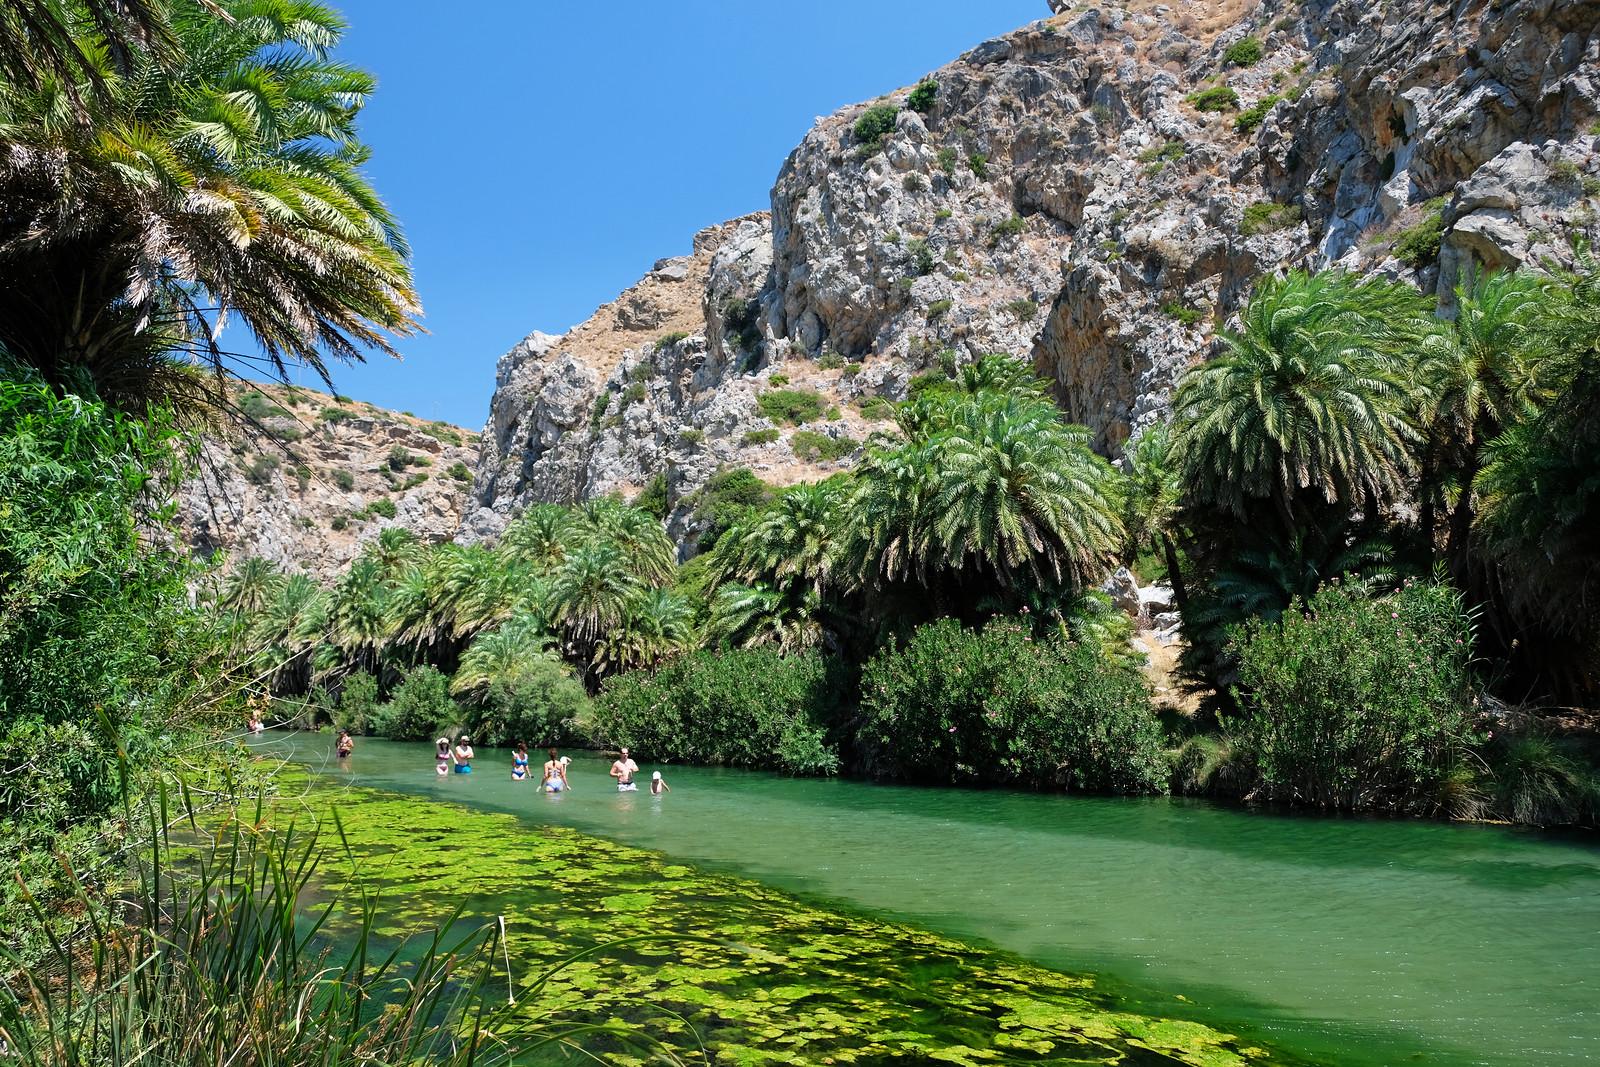 Preveli Palm Canyon, Crete, Greece